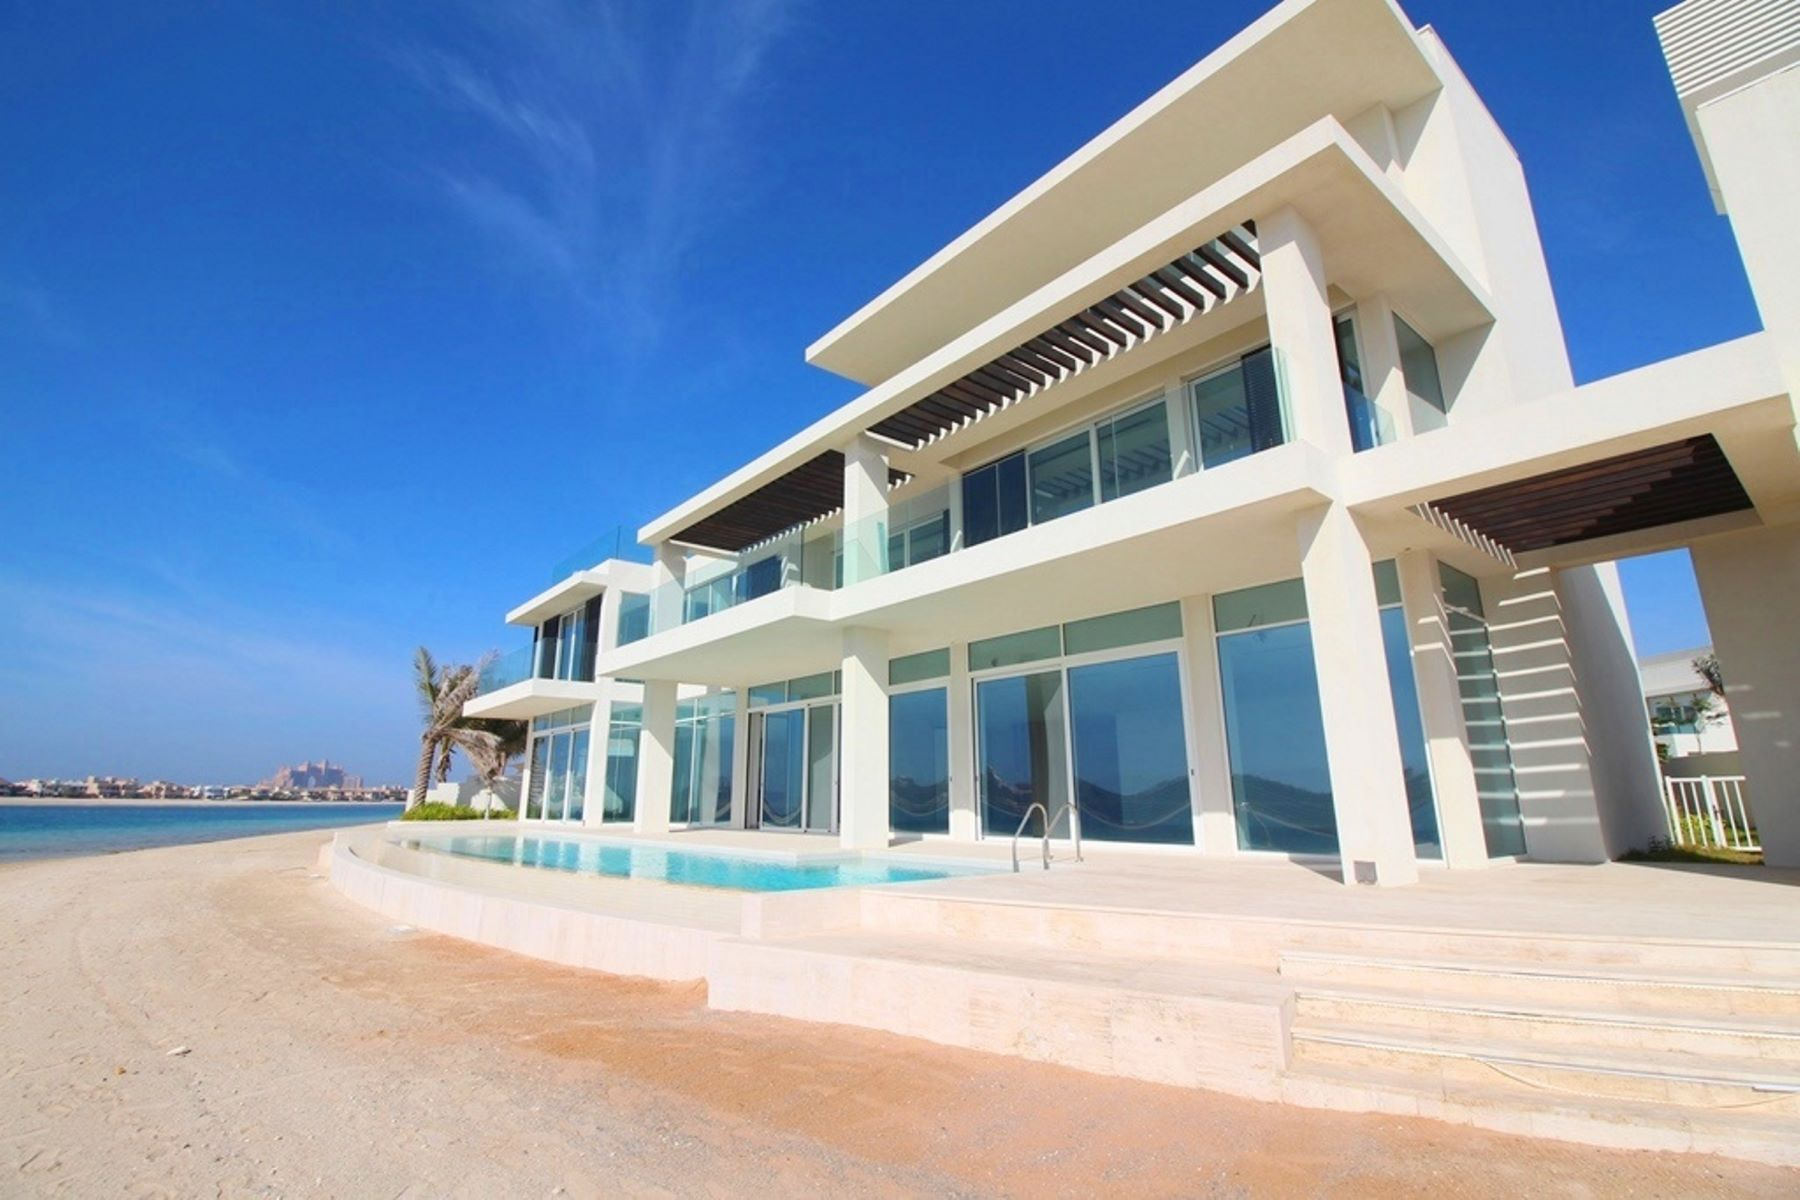 Property for Sale at Brand New 6BR Villa Sunset View Dubai, Dubai United Arab Emirates